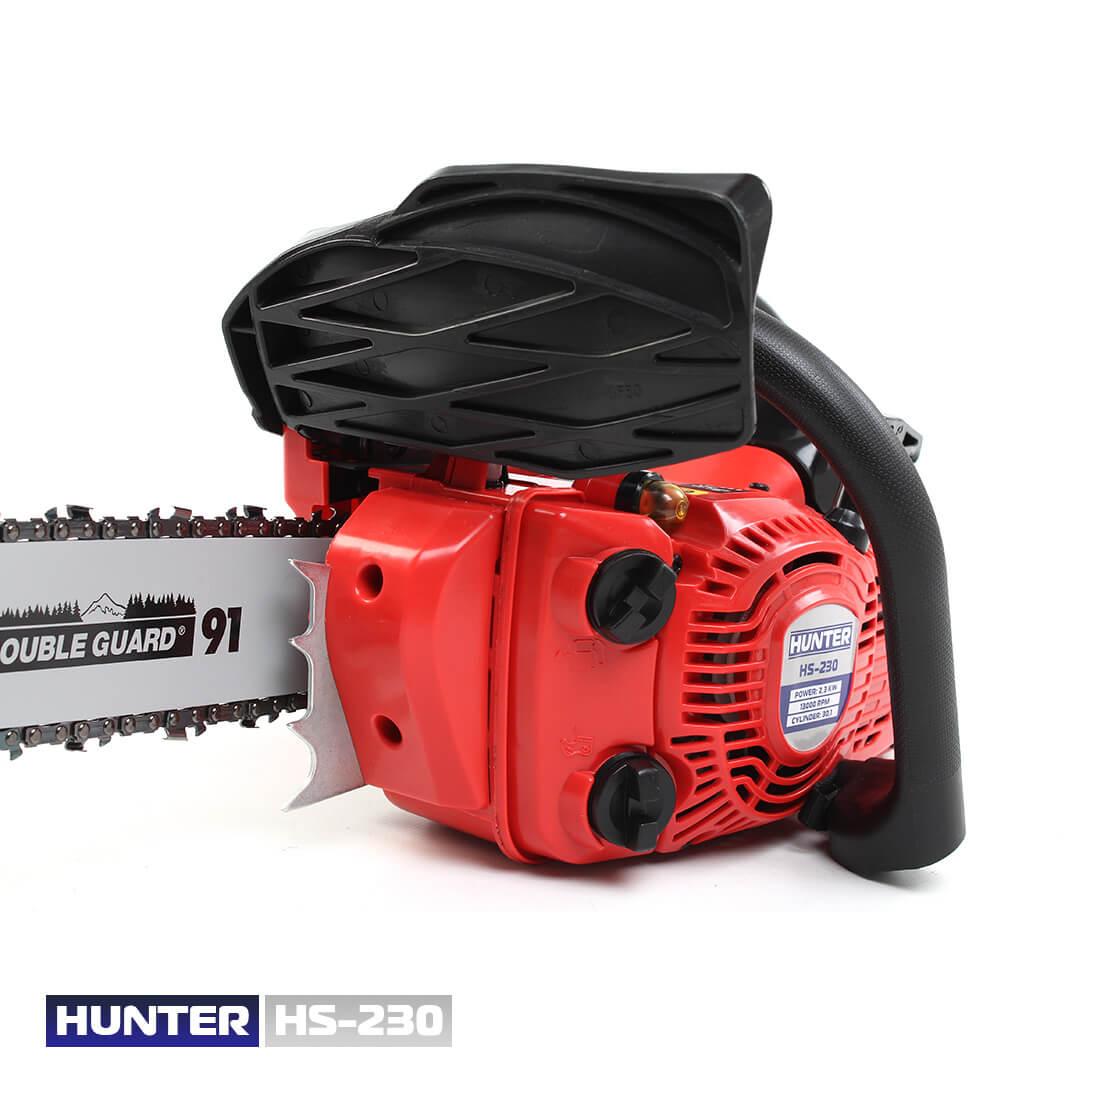 Фото Hunter HS-230 цена 3470грн №8 — Hunter